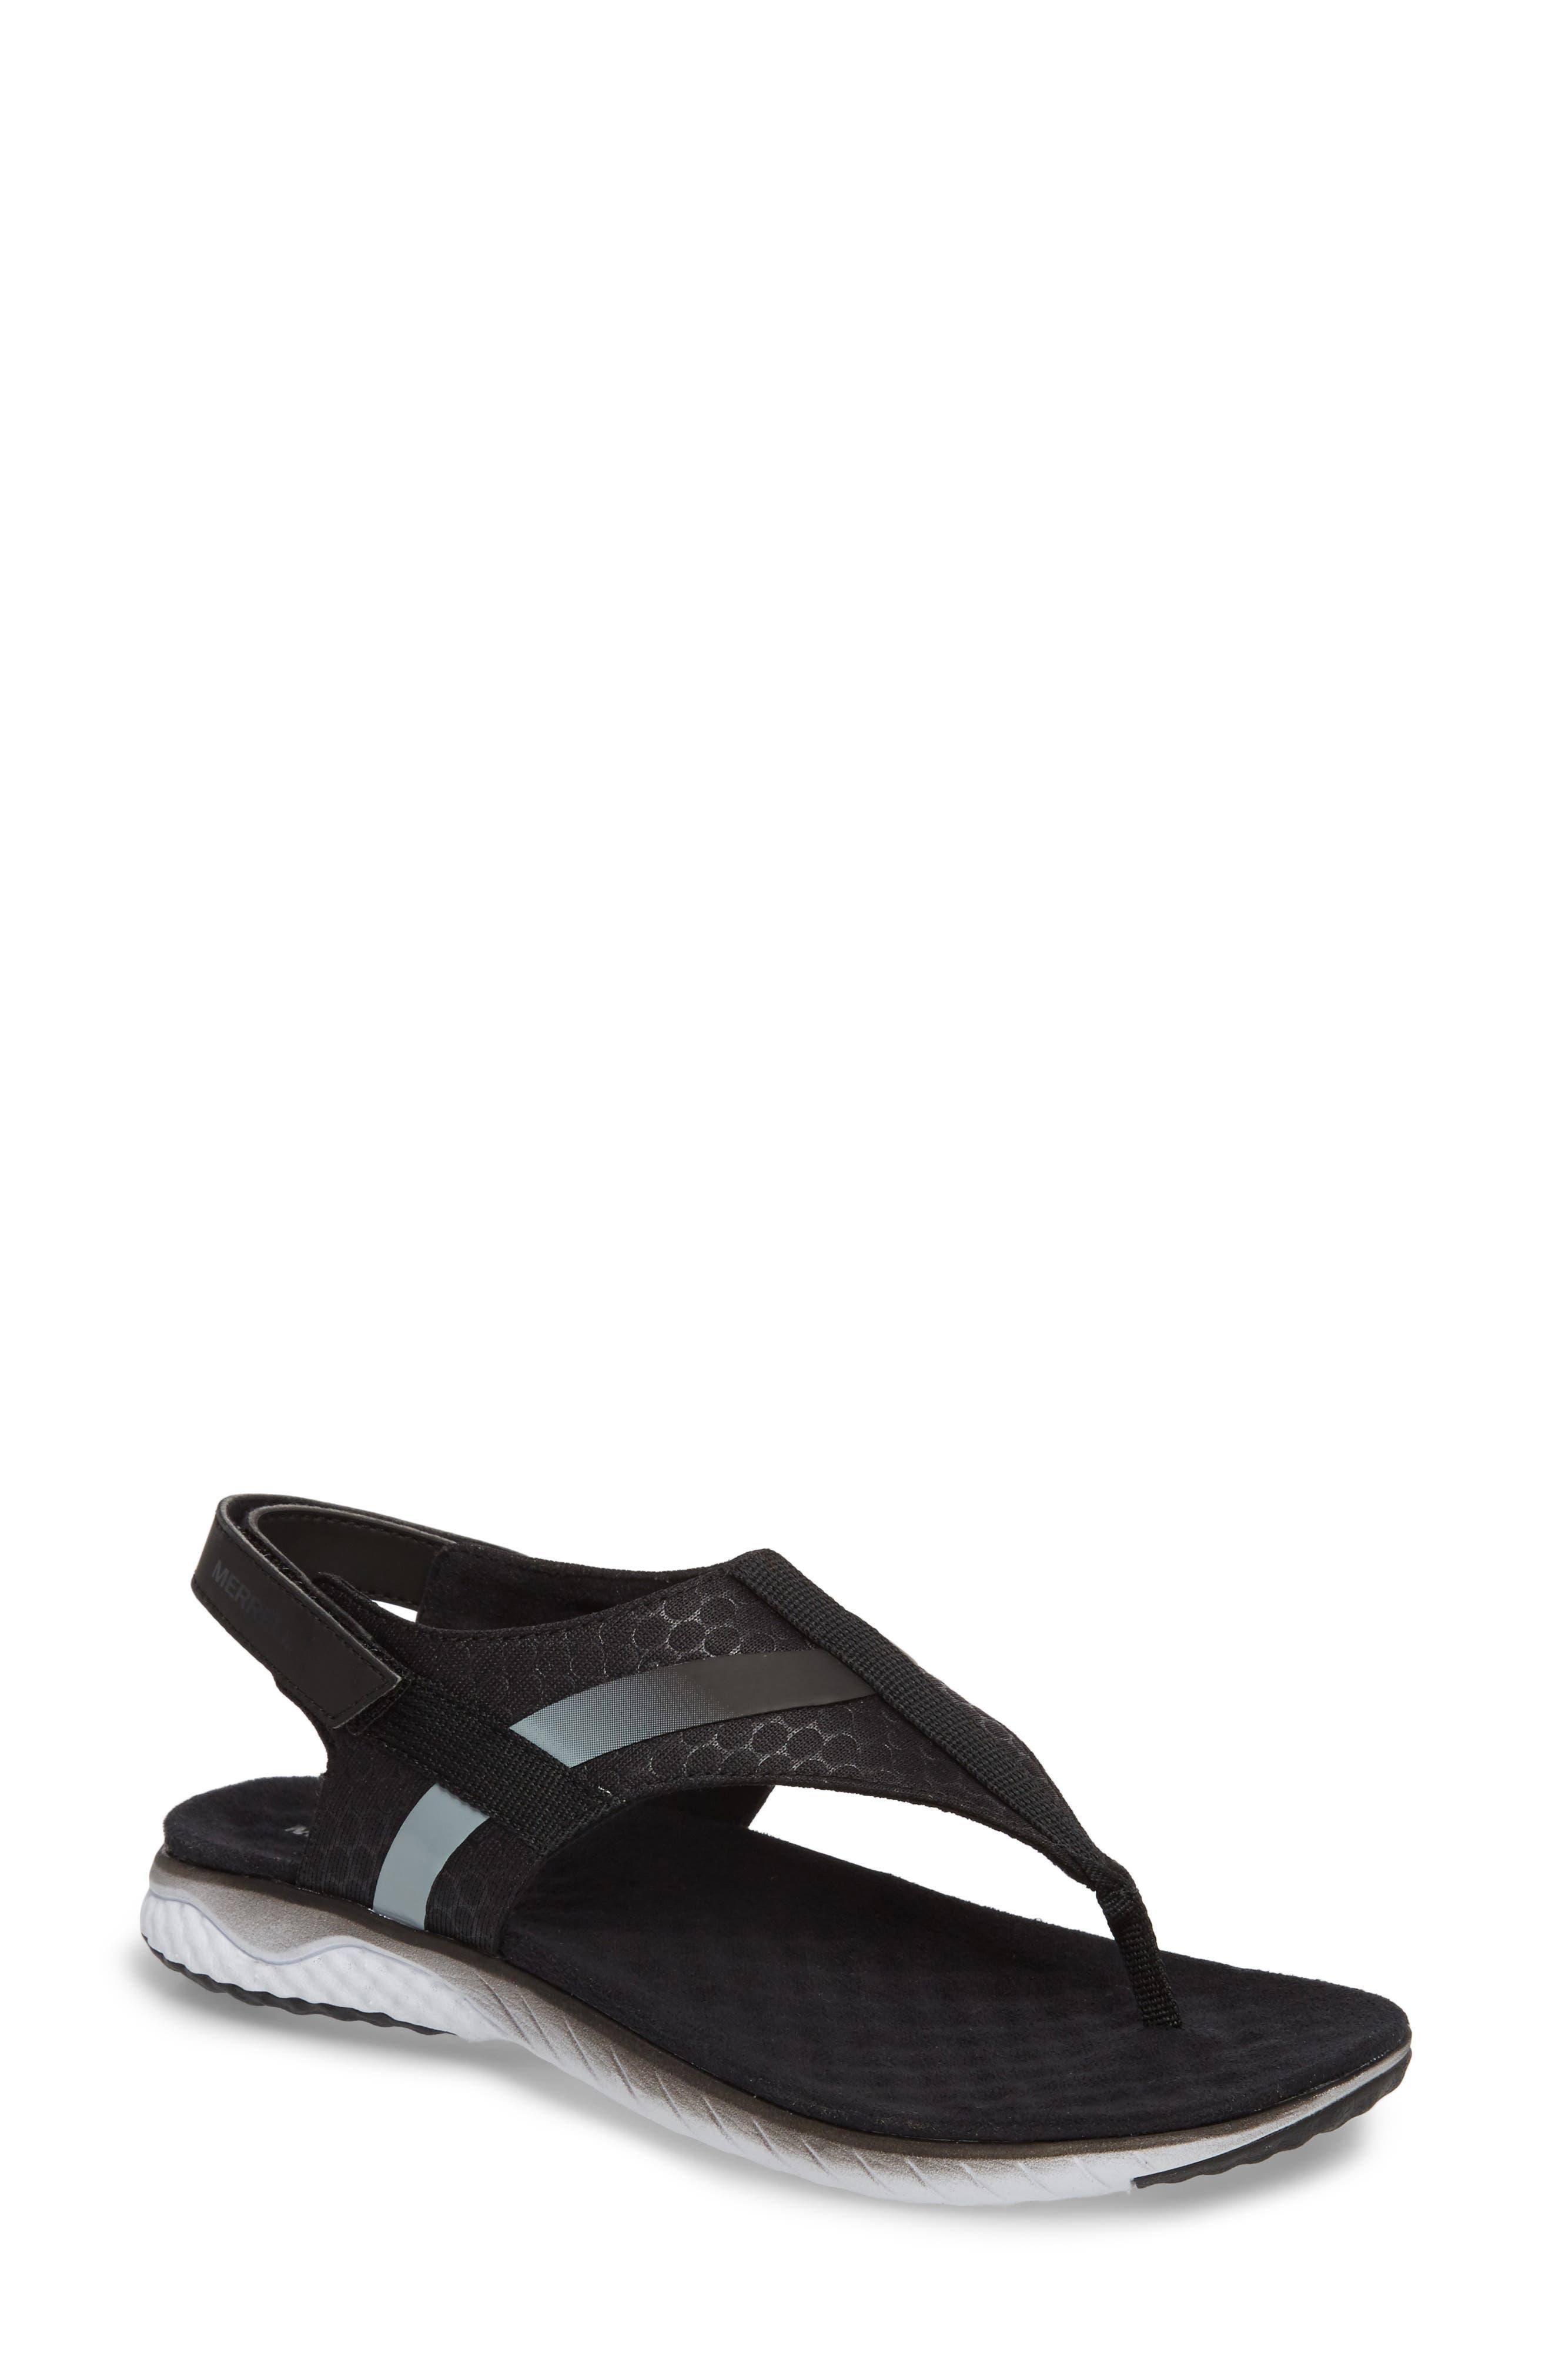 1SIX8 Linna Slide Air Cushion+ Sandal,                         Main,                         color, 001